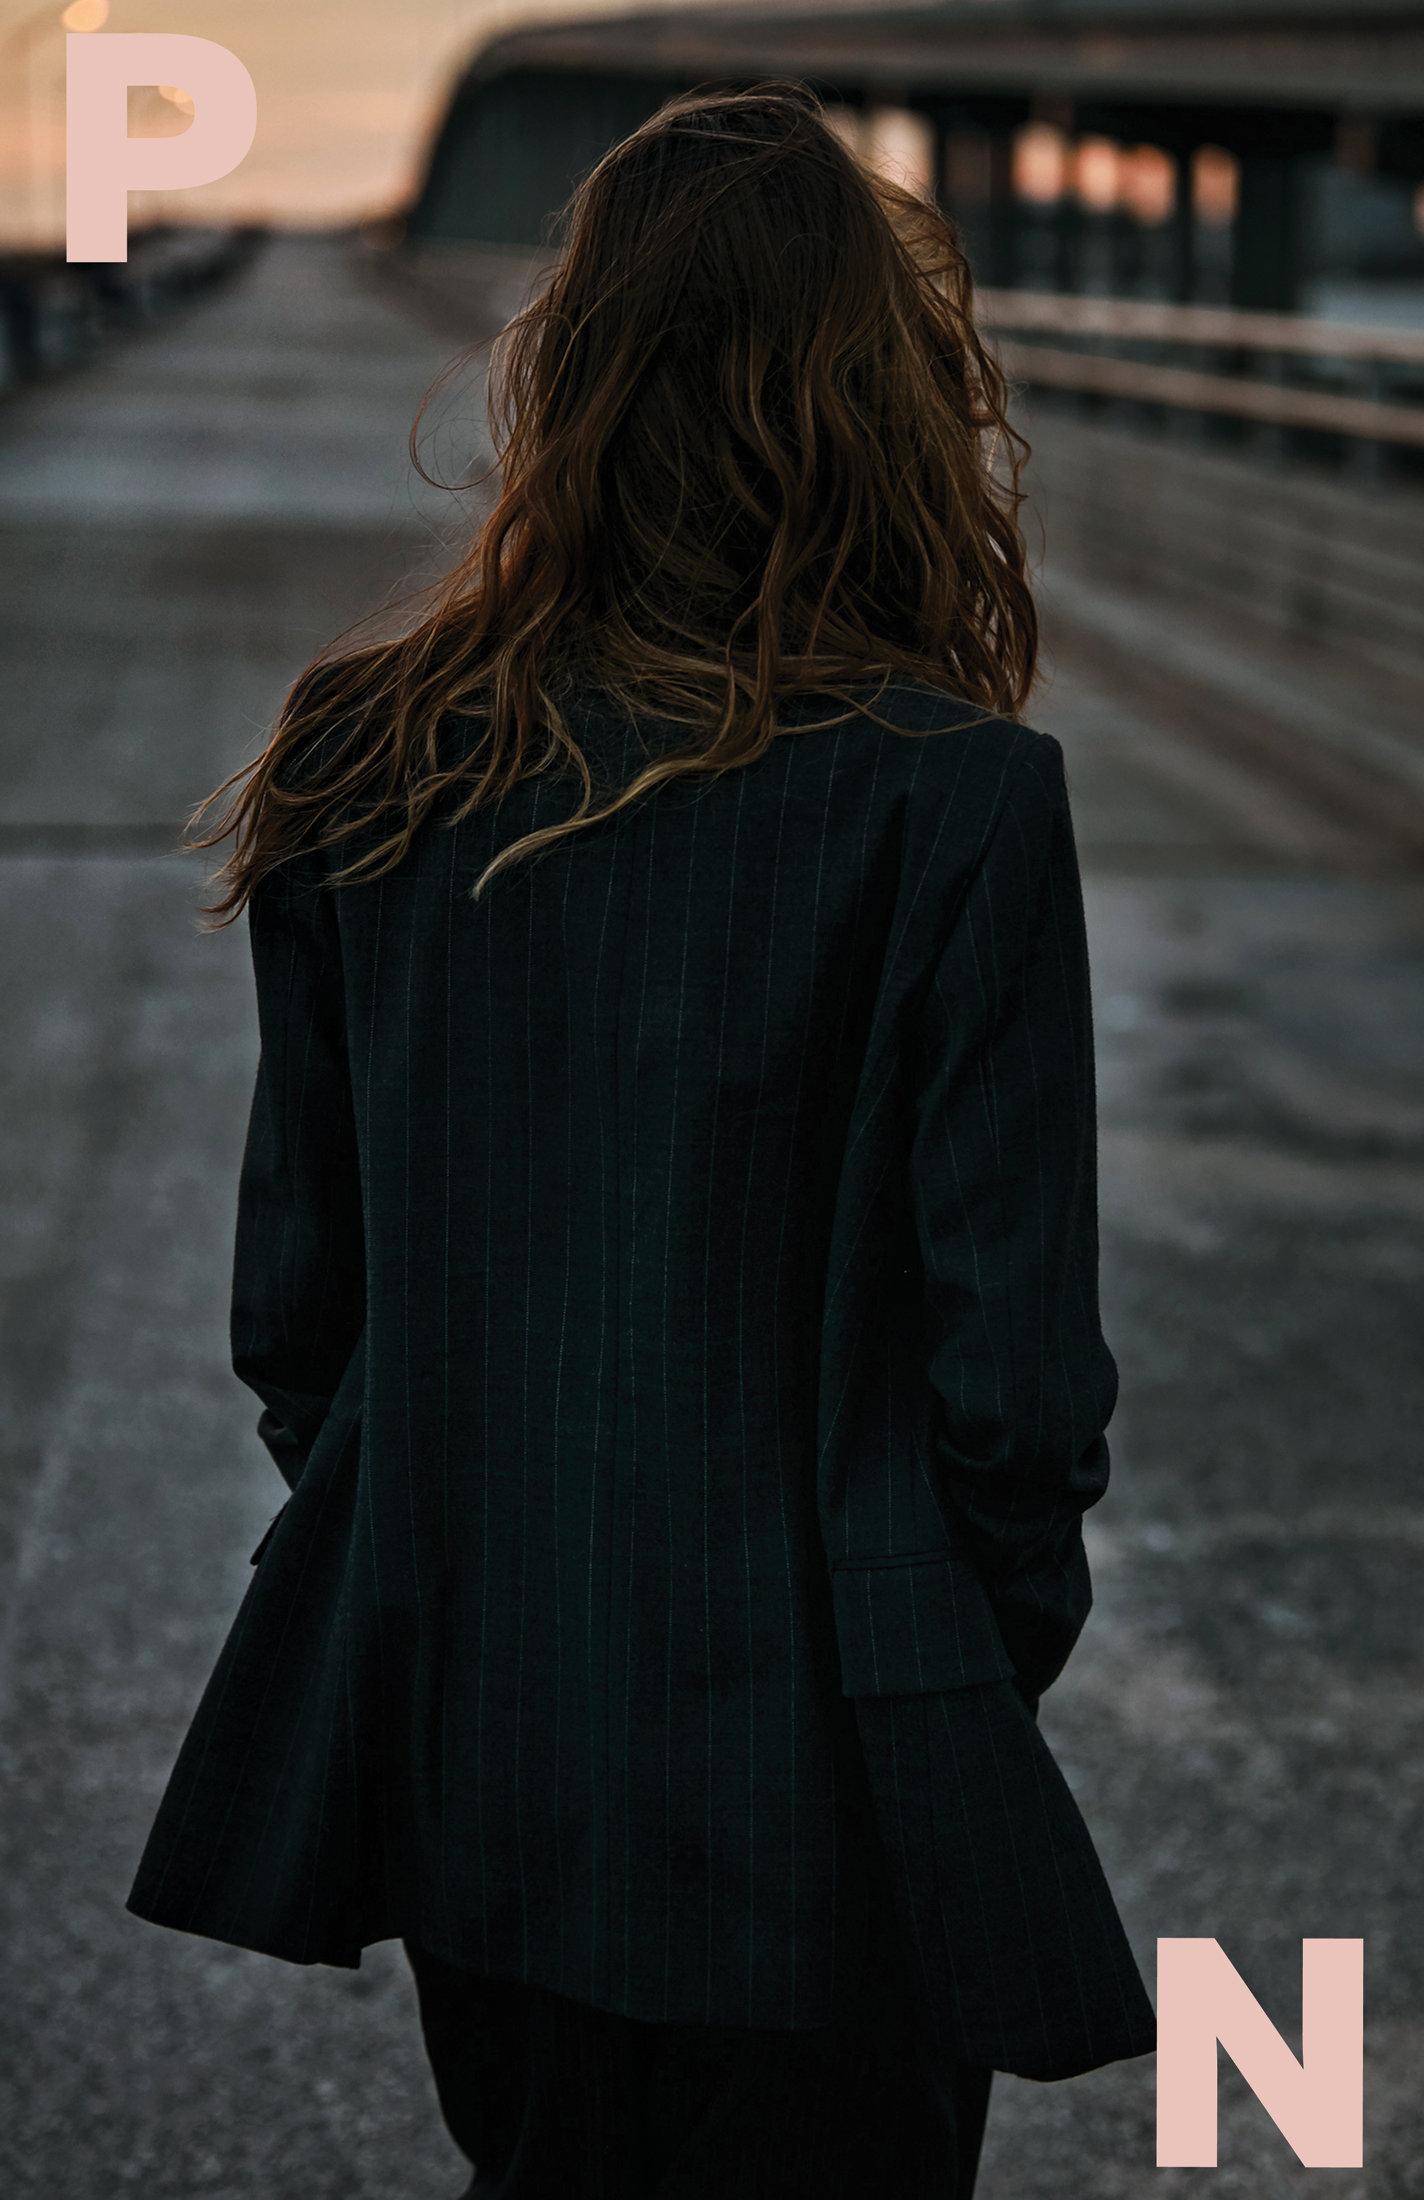 laken-das-model_fashion-photographer-nico-stipcianos-miami-copy-2-nyc.jpg